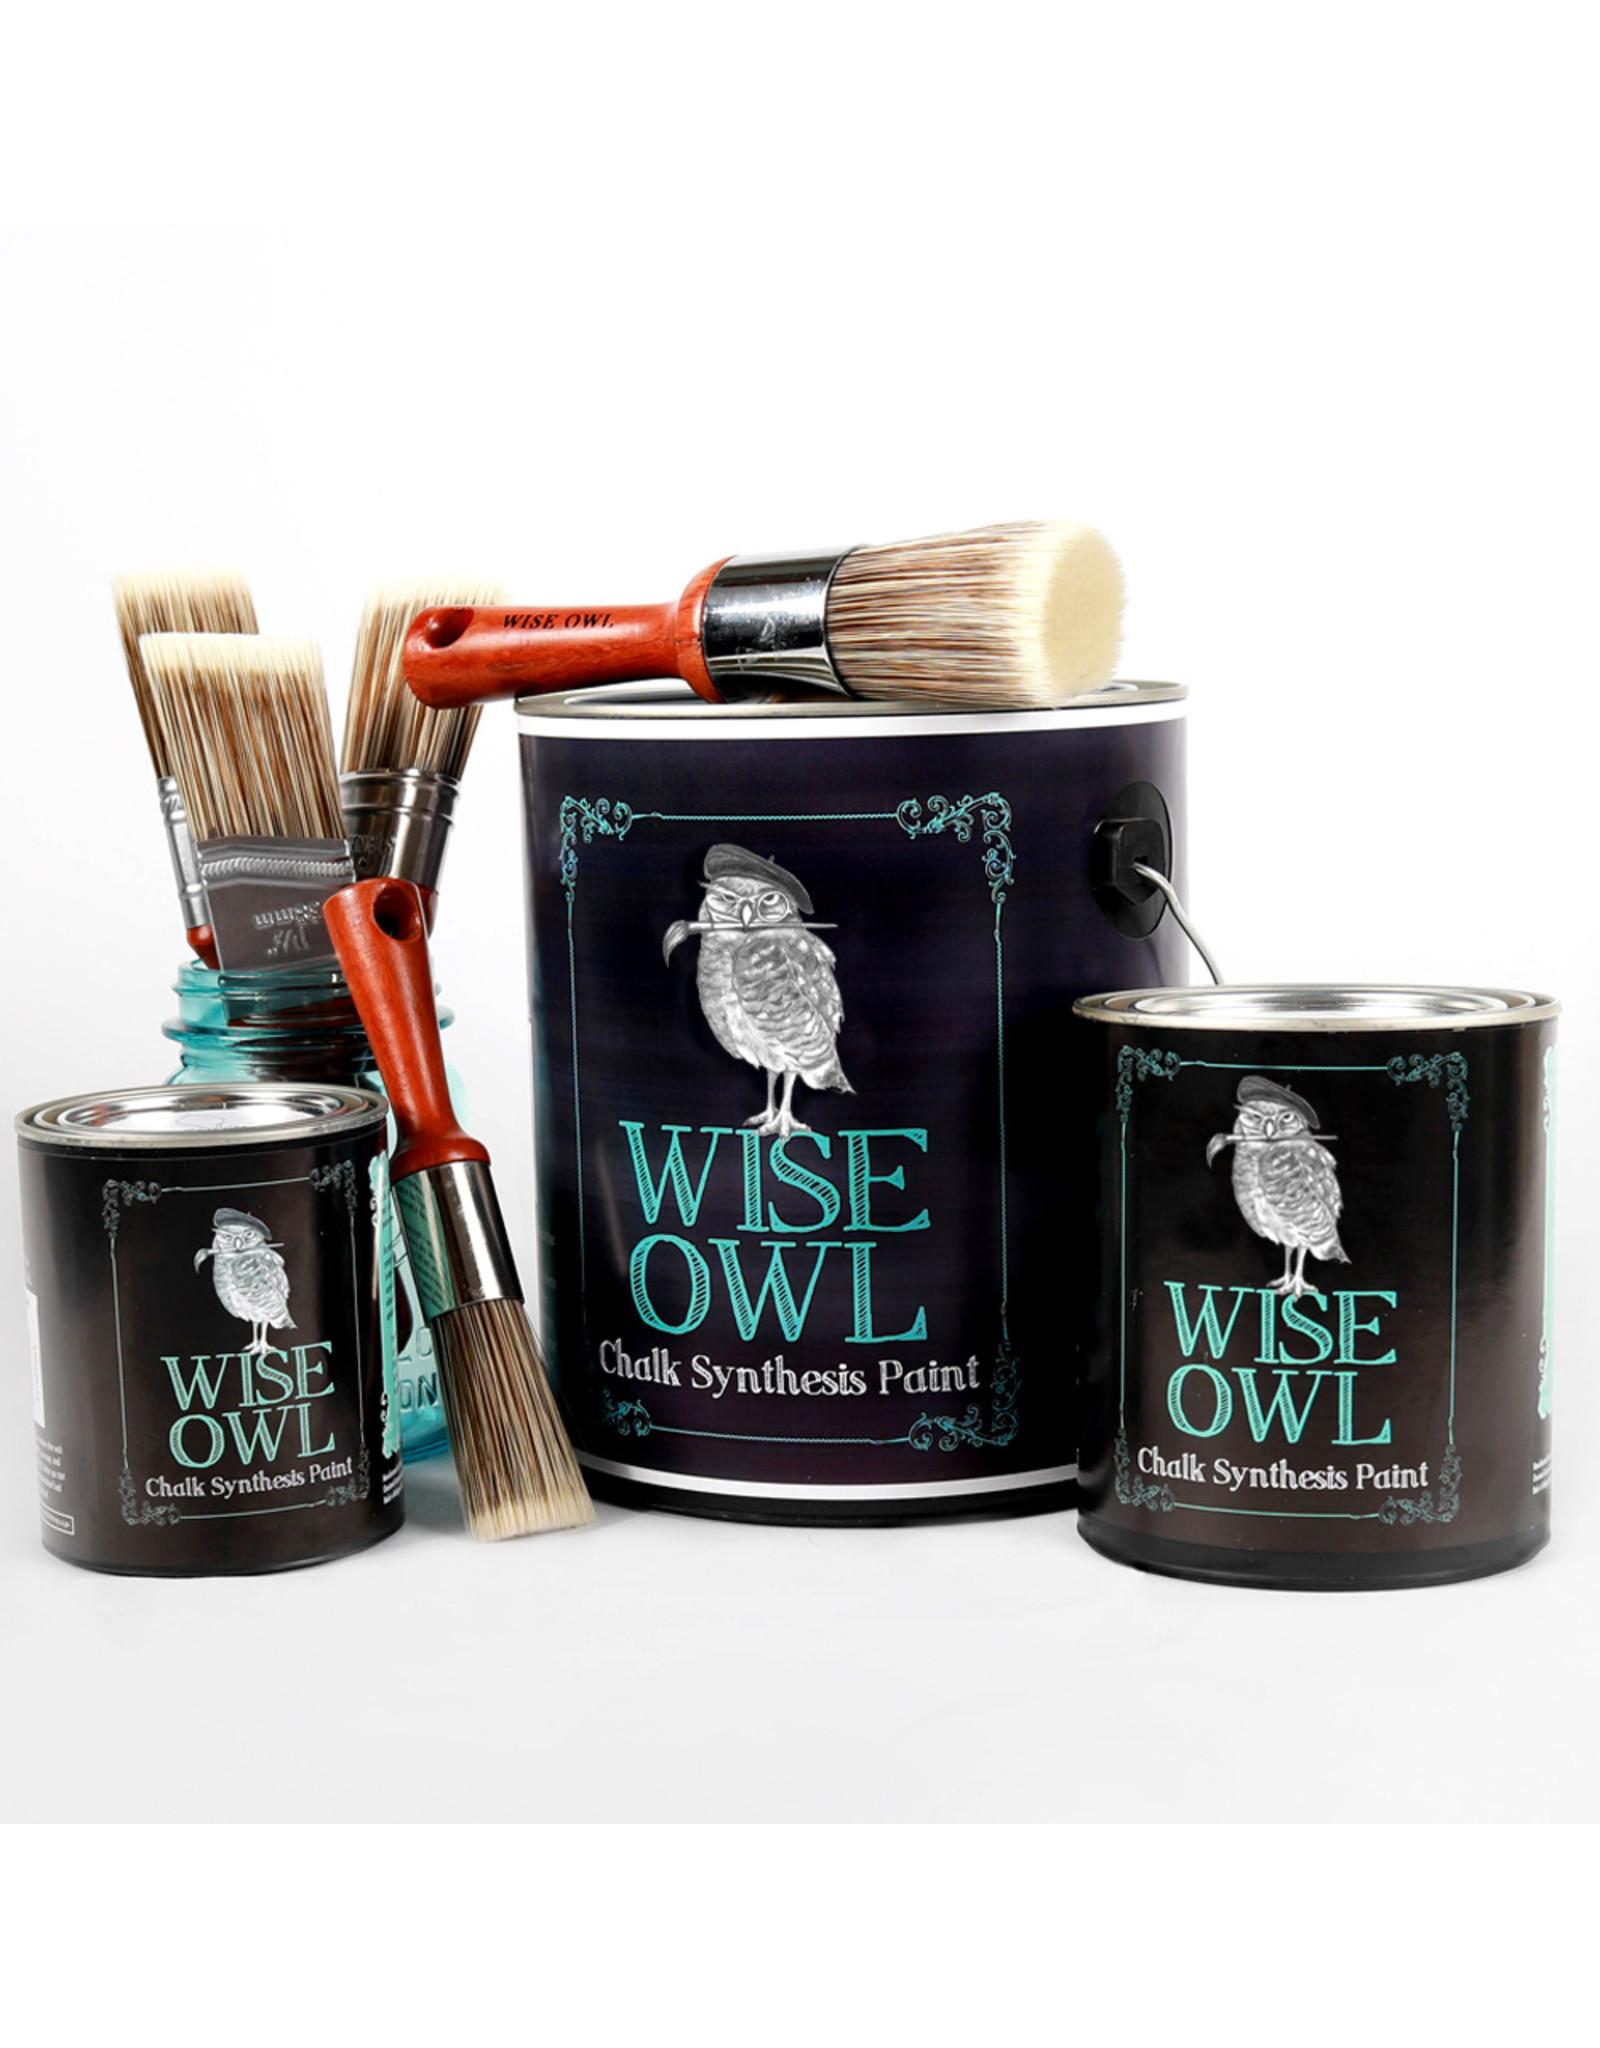 Wise Owl Paint Chalk Synthesis Paint Poseidon-Pint